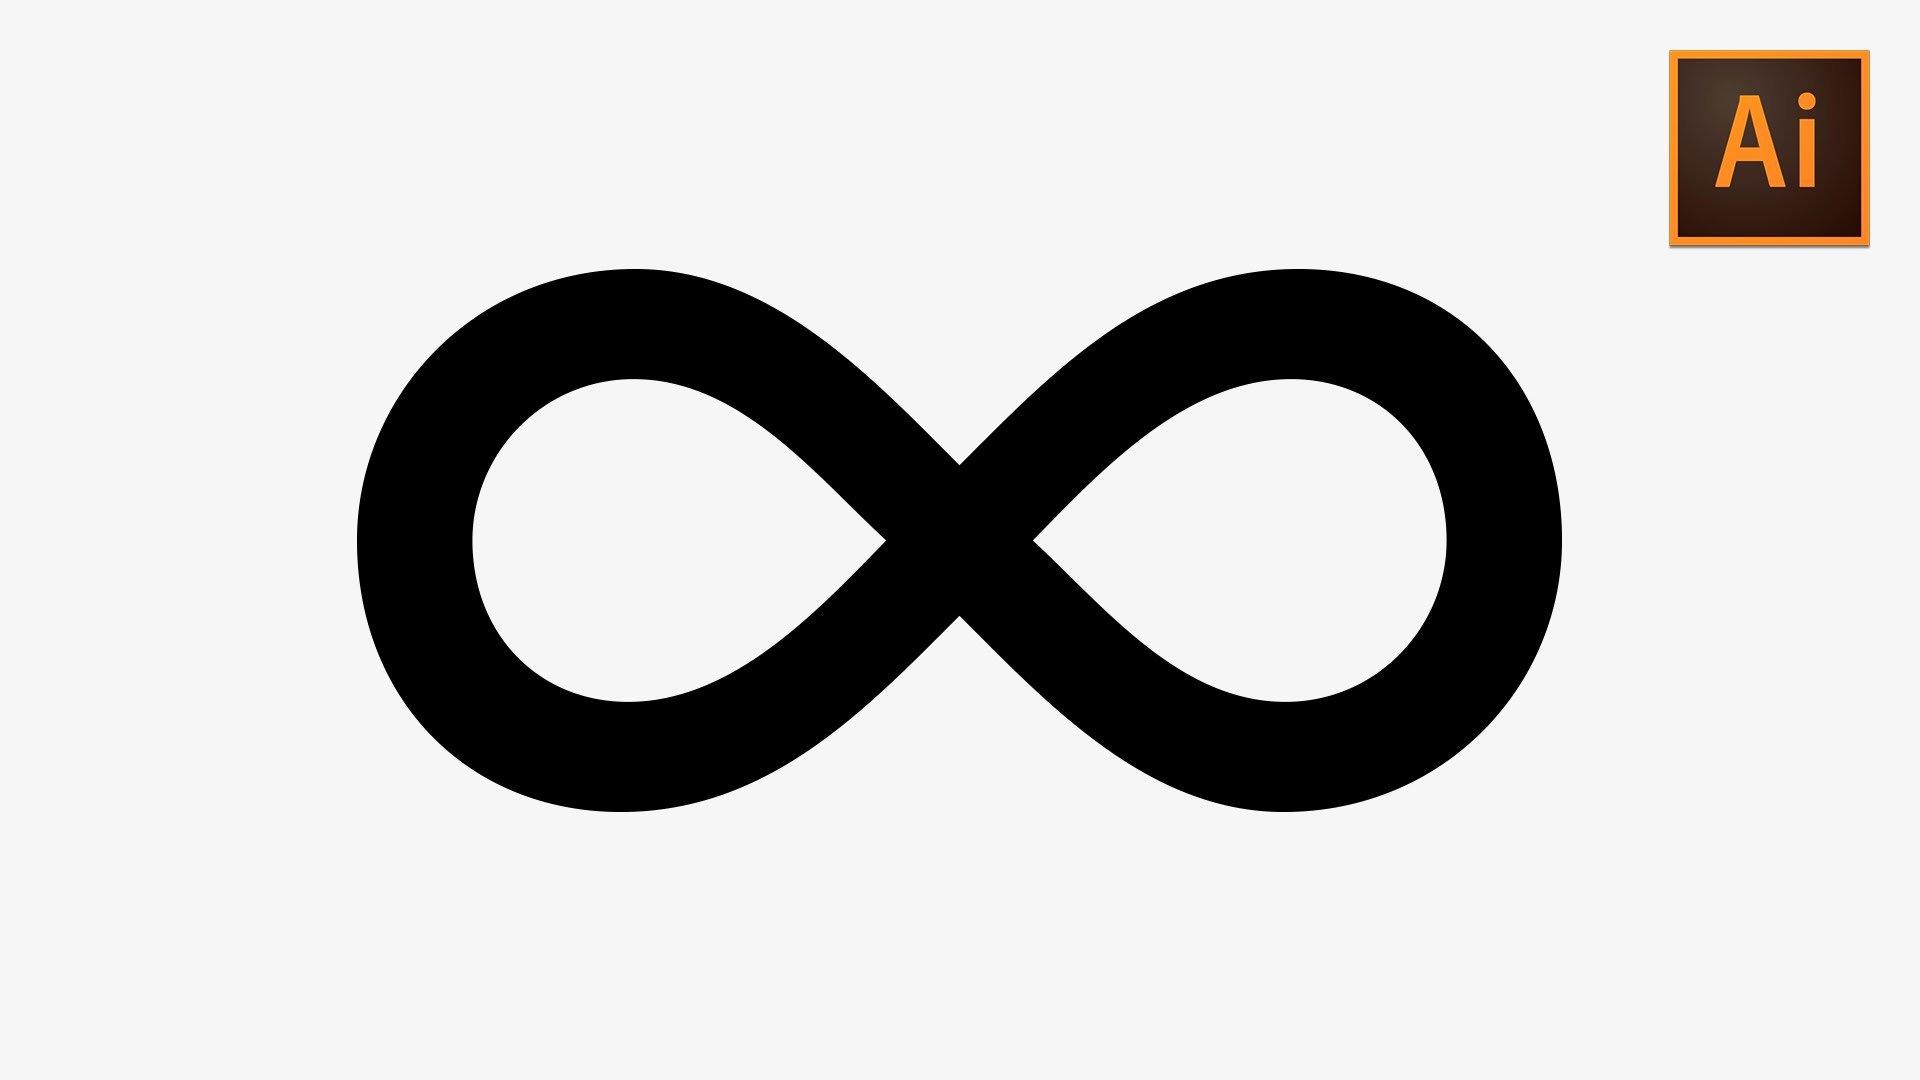 Infinity clipart infiniti Infinity to Adobe Art